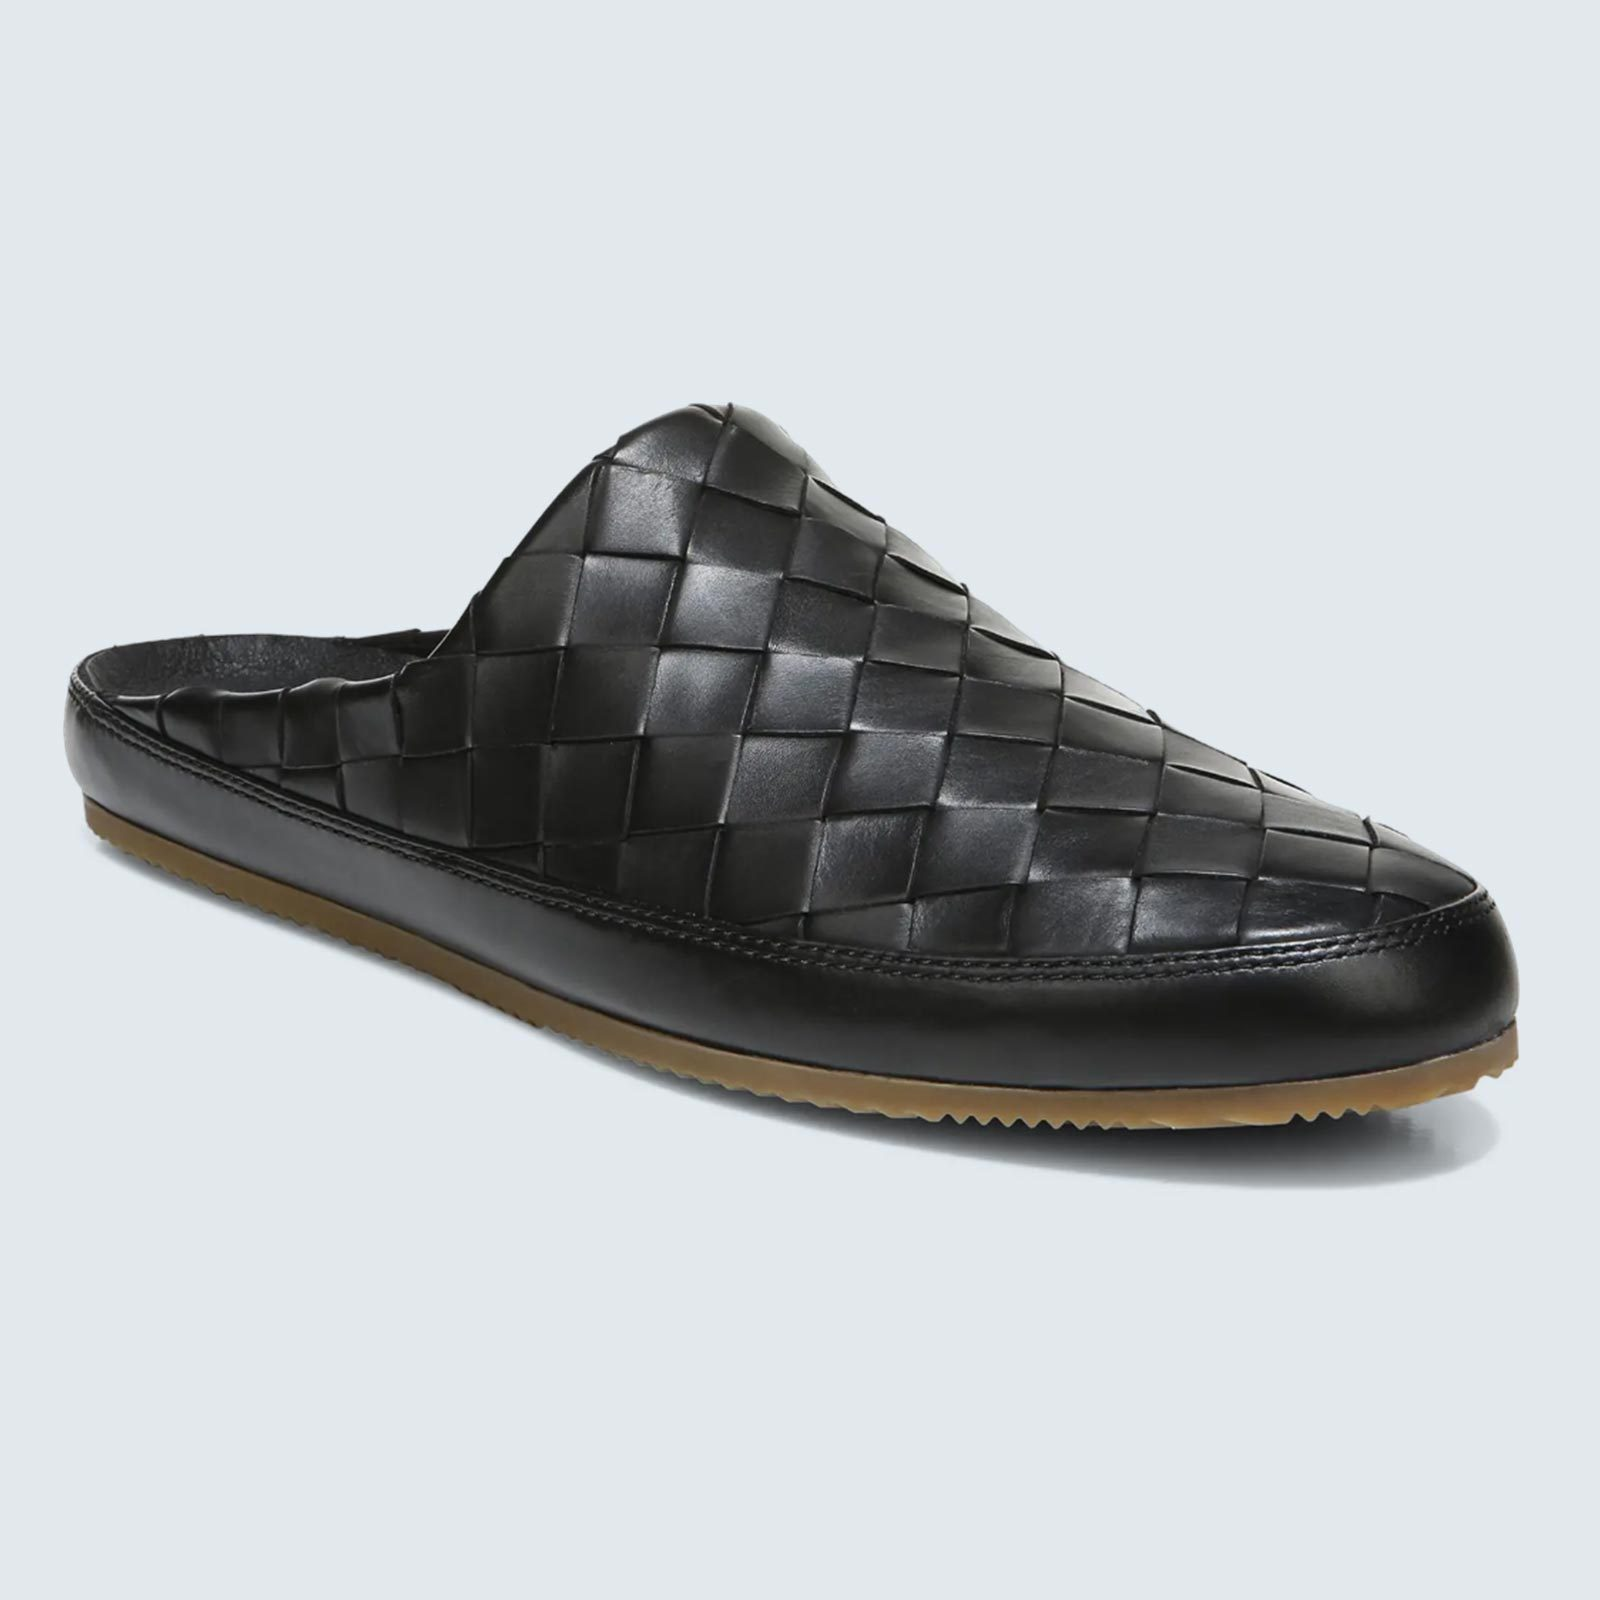 Best splurge-worthy slippers: Vince Alonzo 2 Scuff Slipper